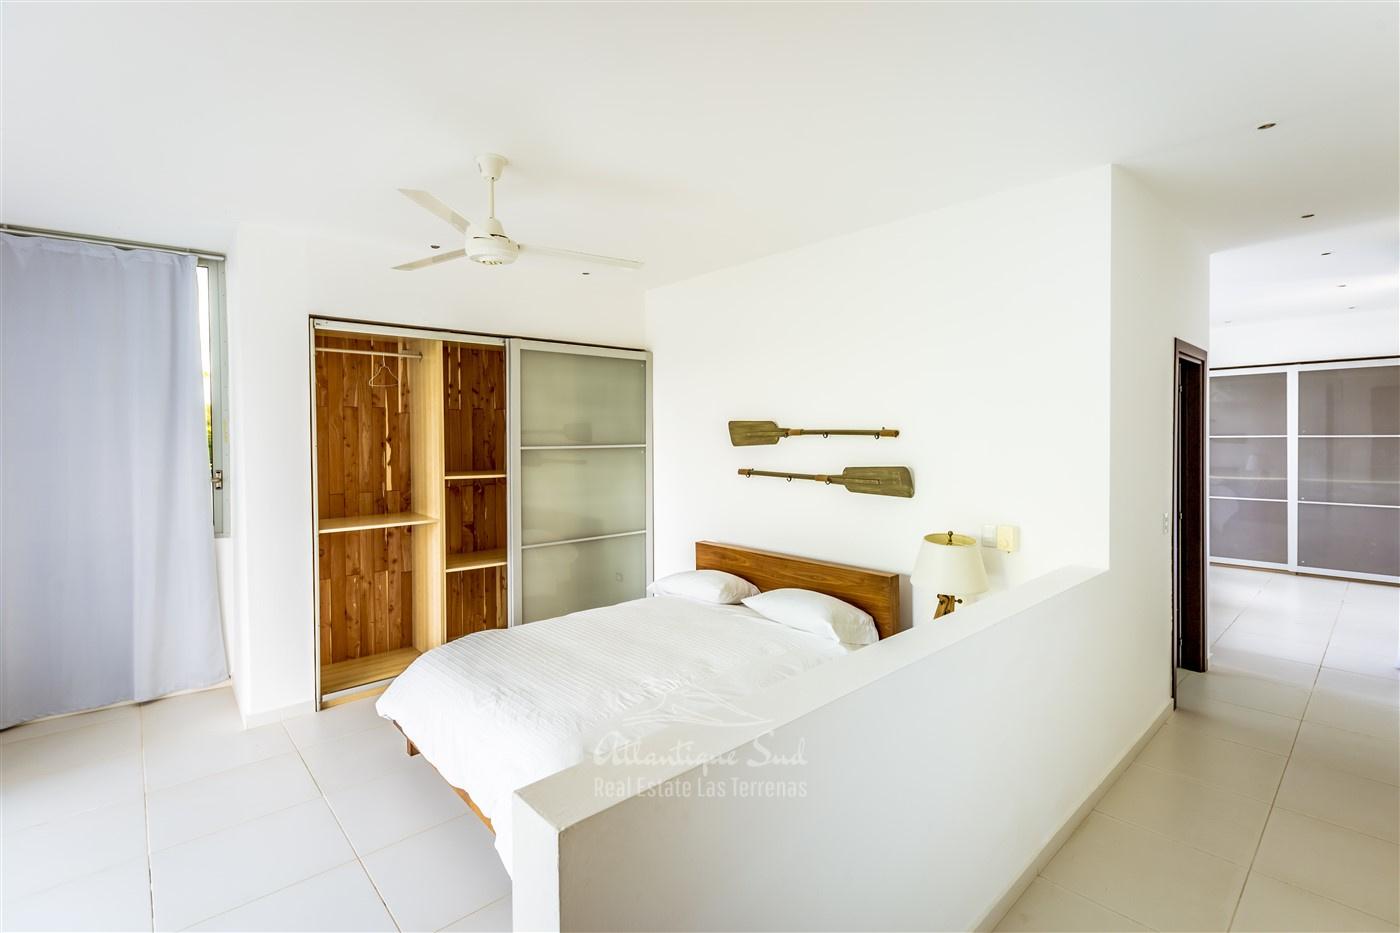 Modern Villa on a hill with ocean views Real Estate Las Terrenas Dominican Republic20.jpg